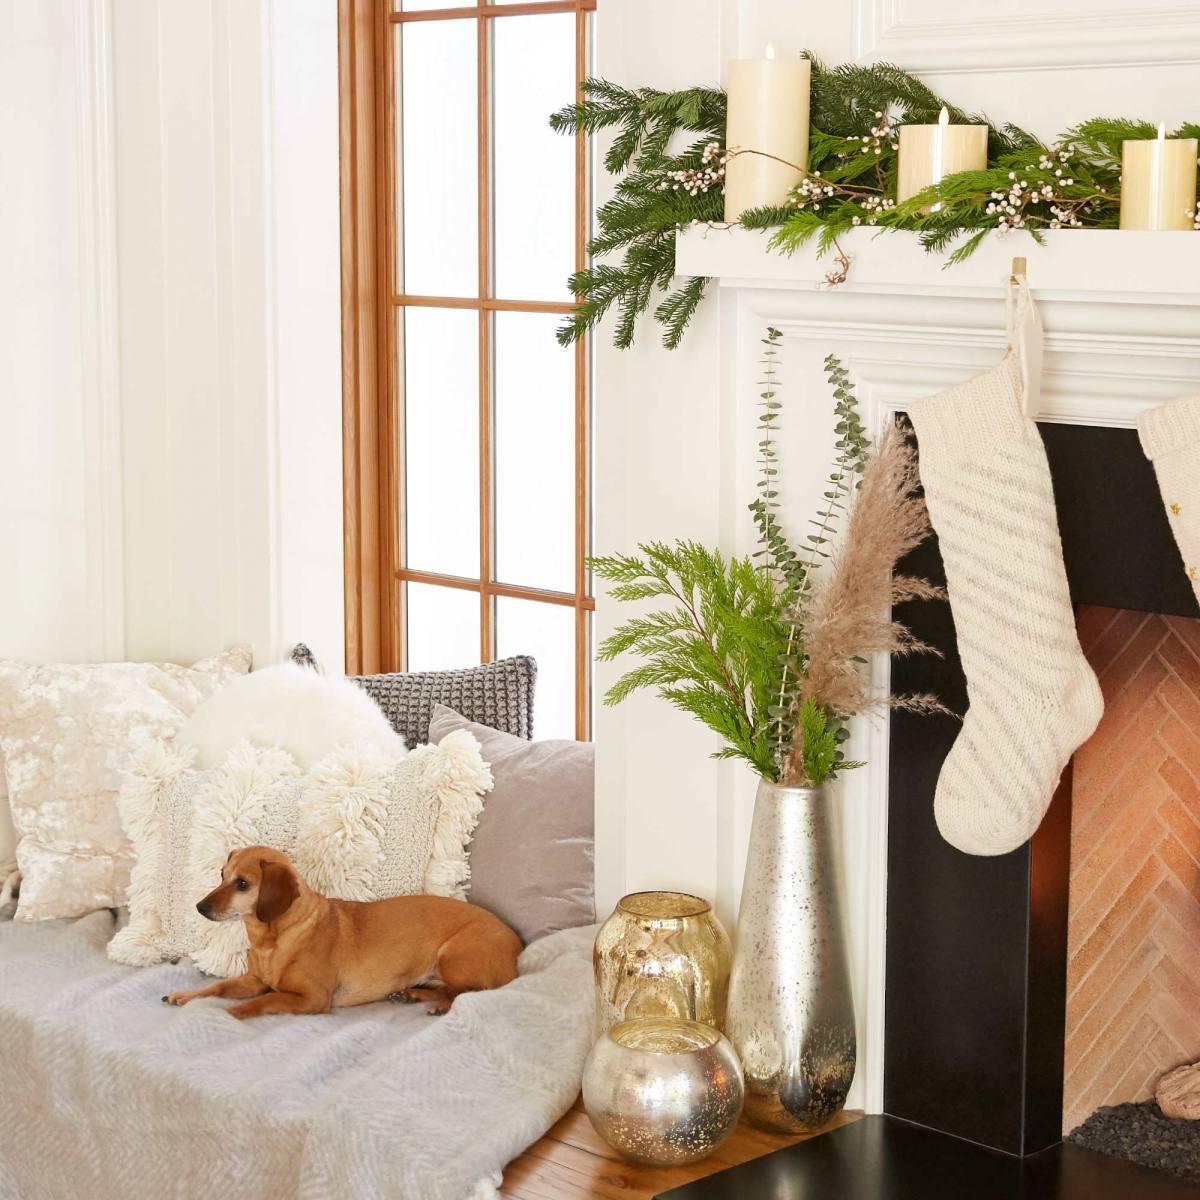 05-eBay_18_November_Social_Cozy_Home_With_Dog_0636